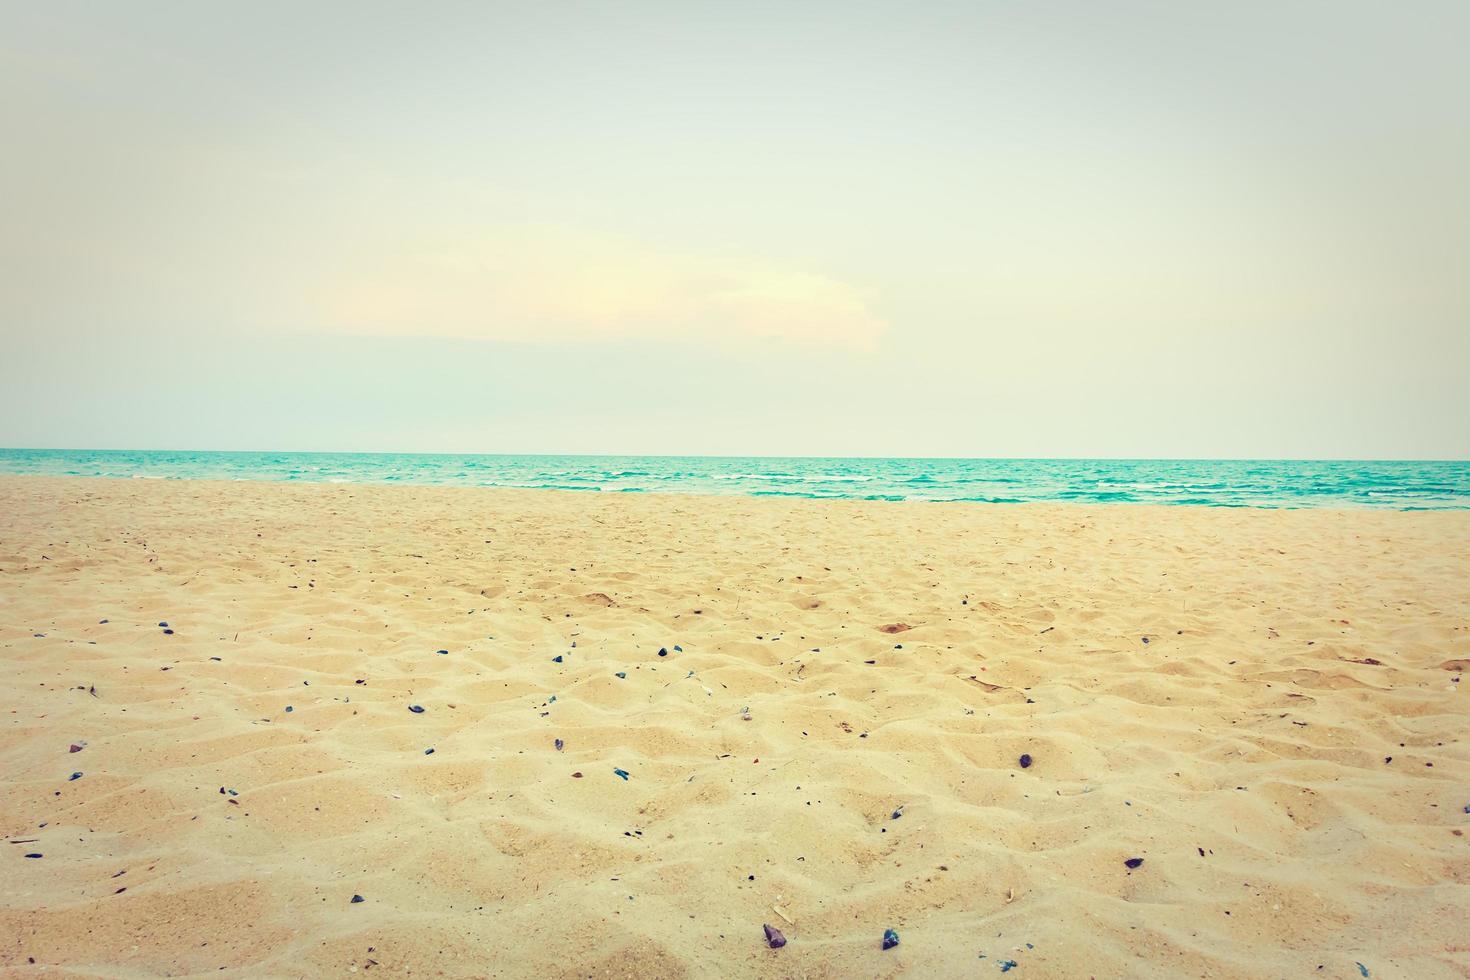 zand op het strand foto